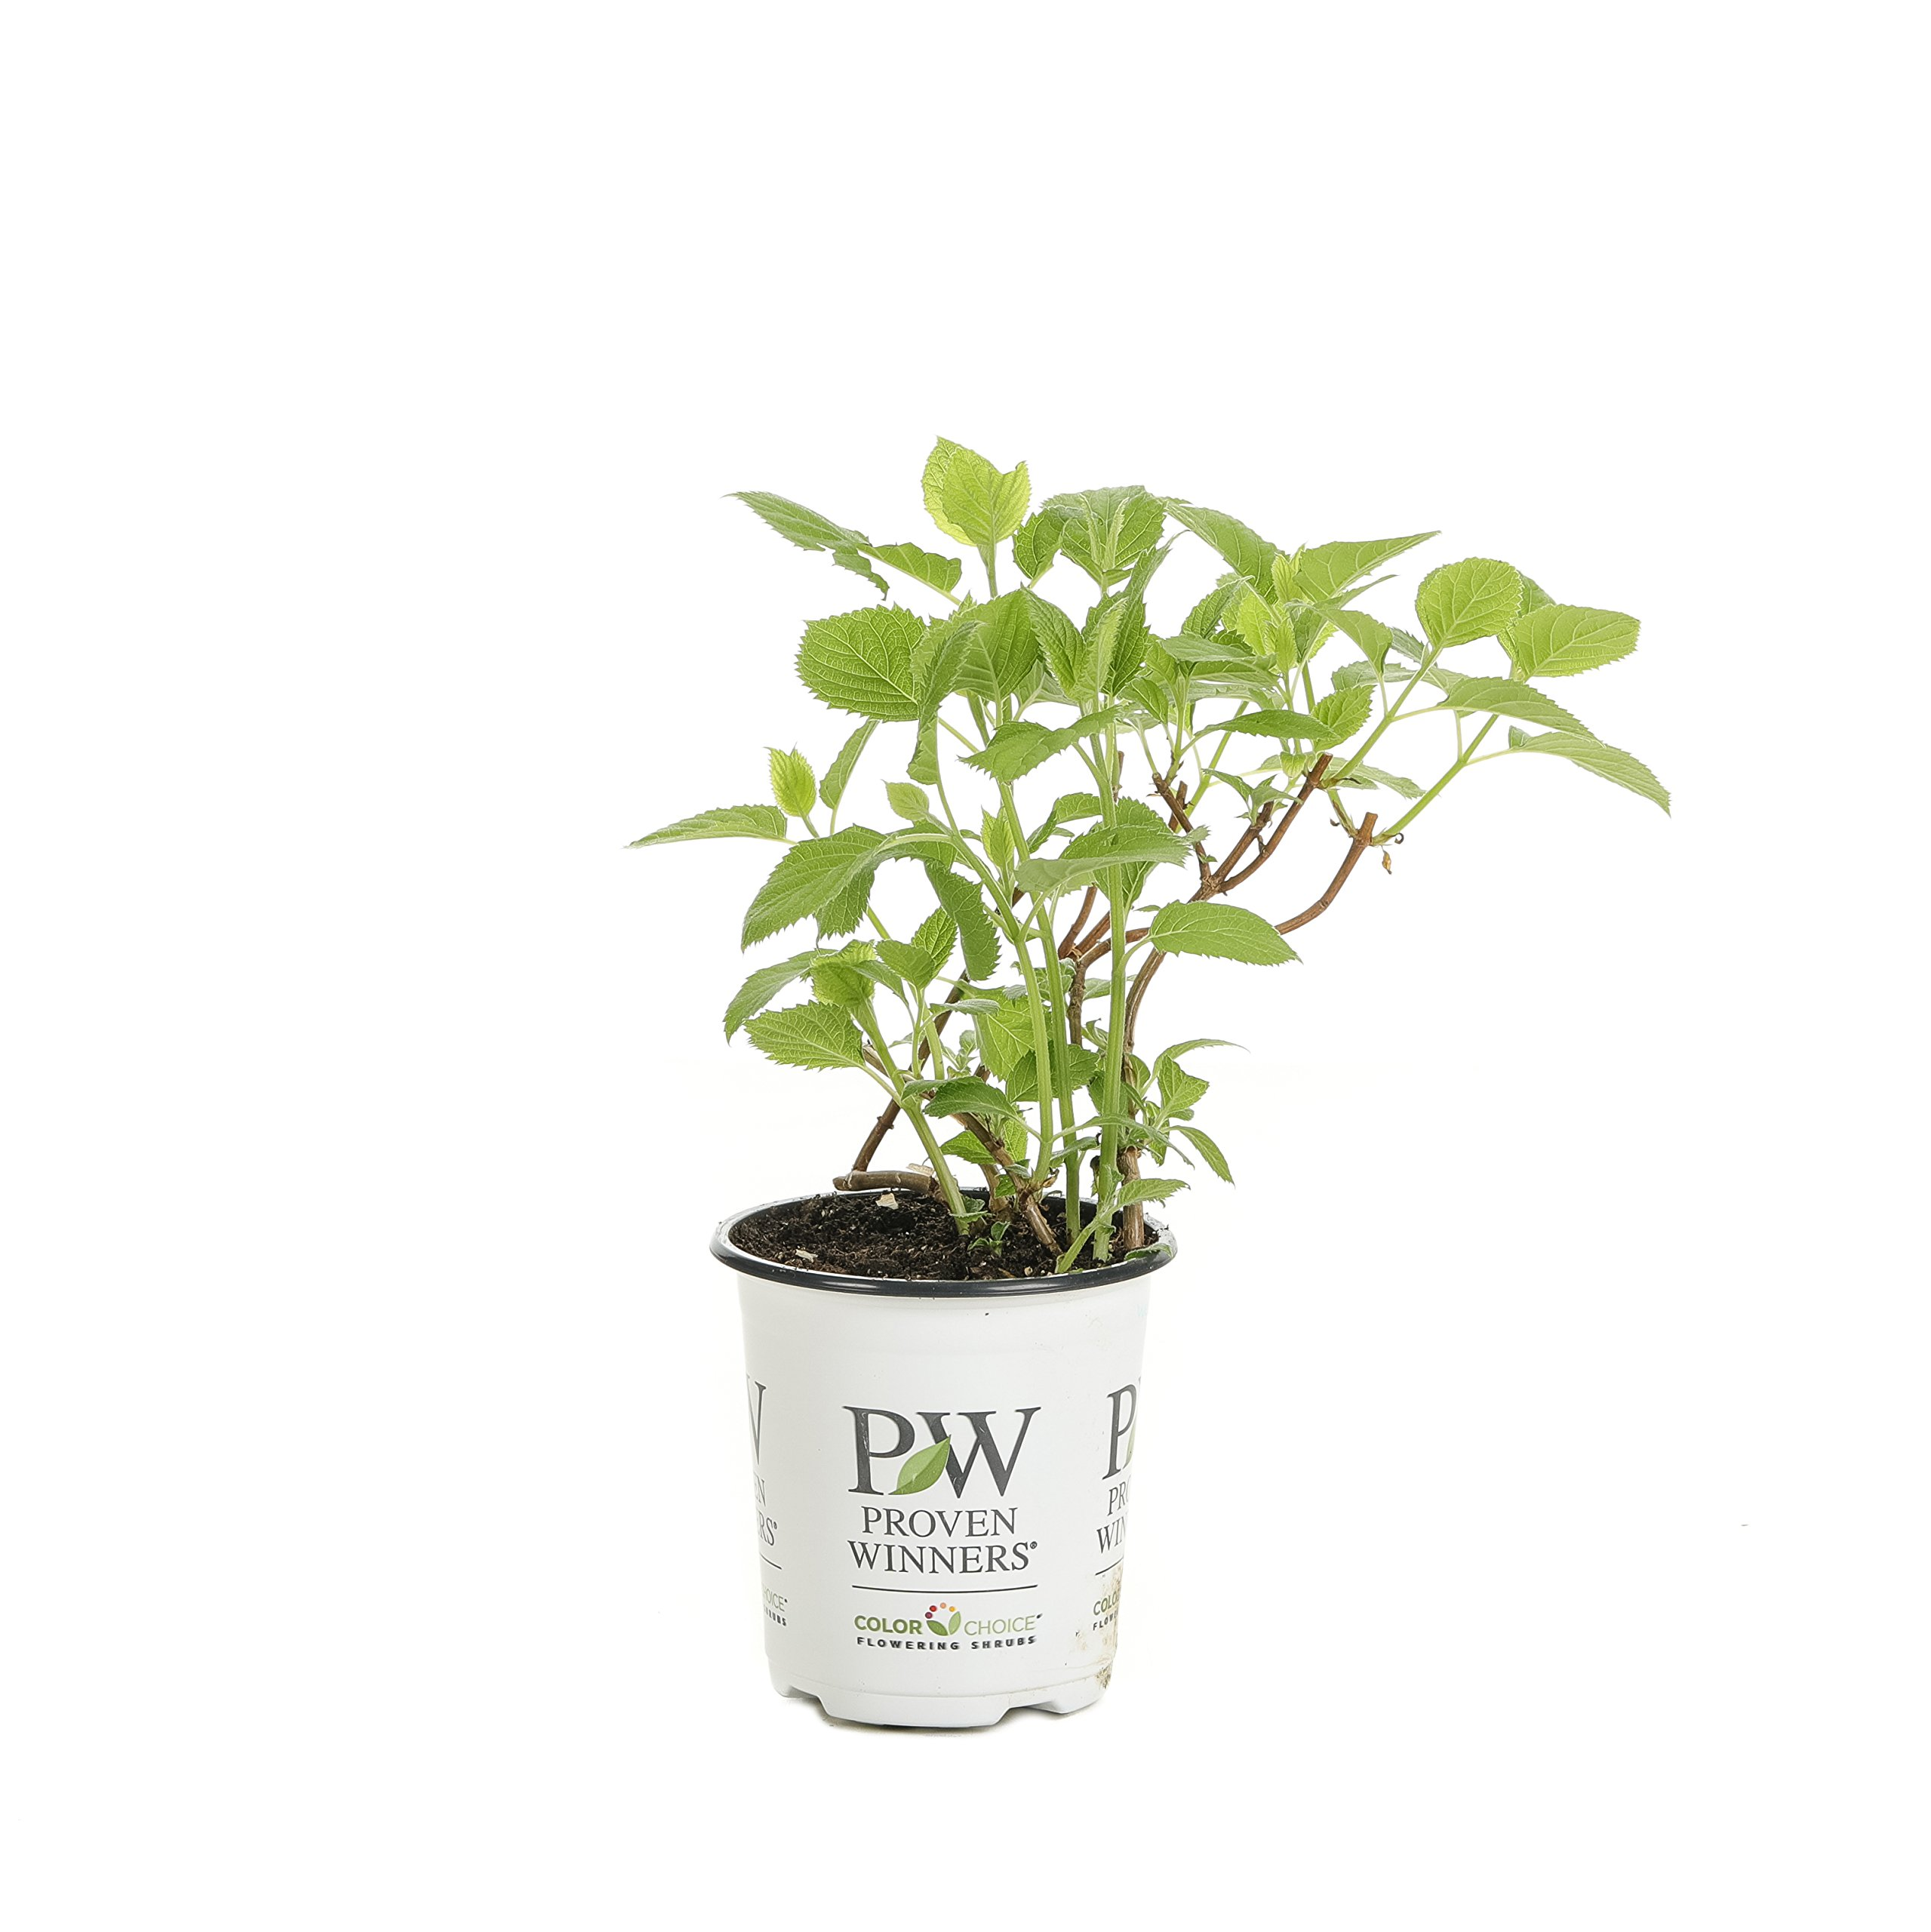 Invincibelle Wee White Smooth Hydrangea, Live Shrub, White Flowers, 4.5 in. Quart